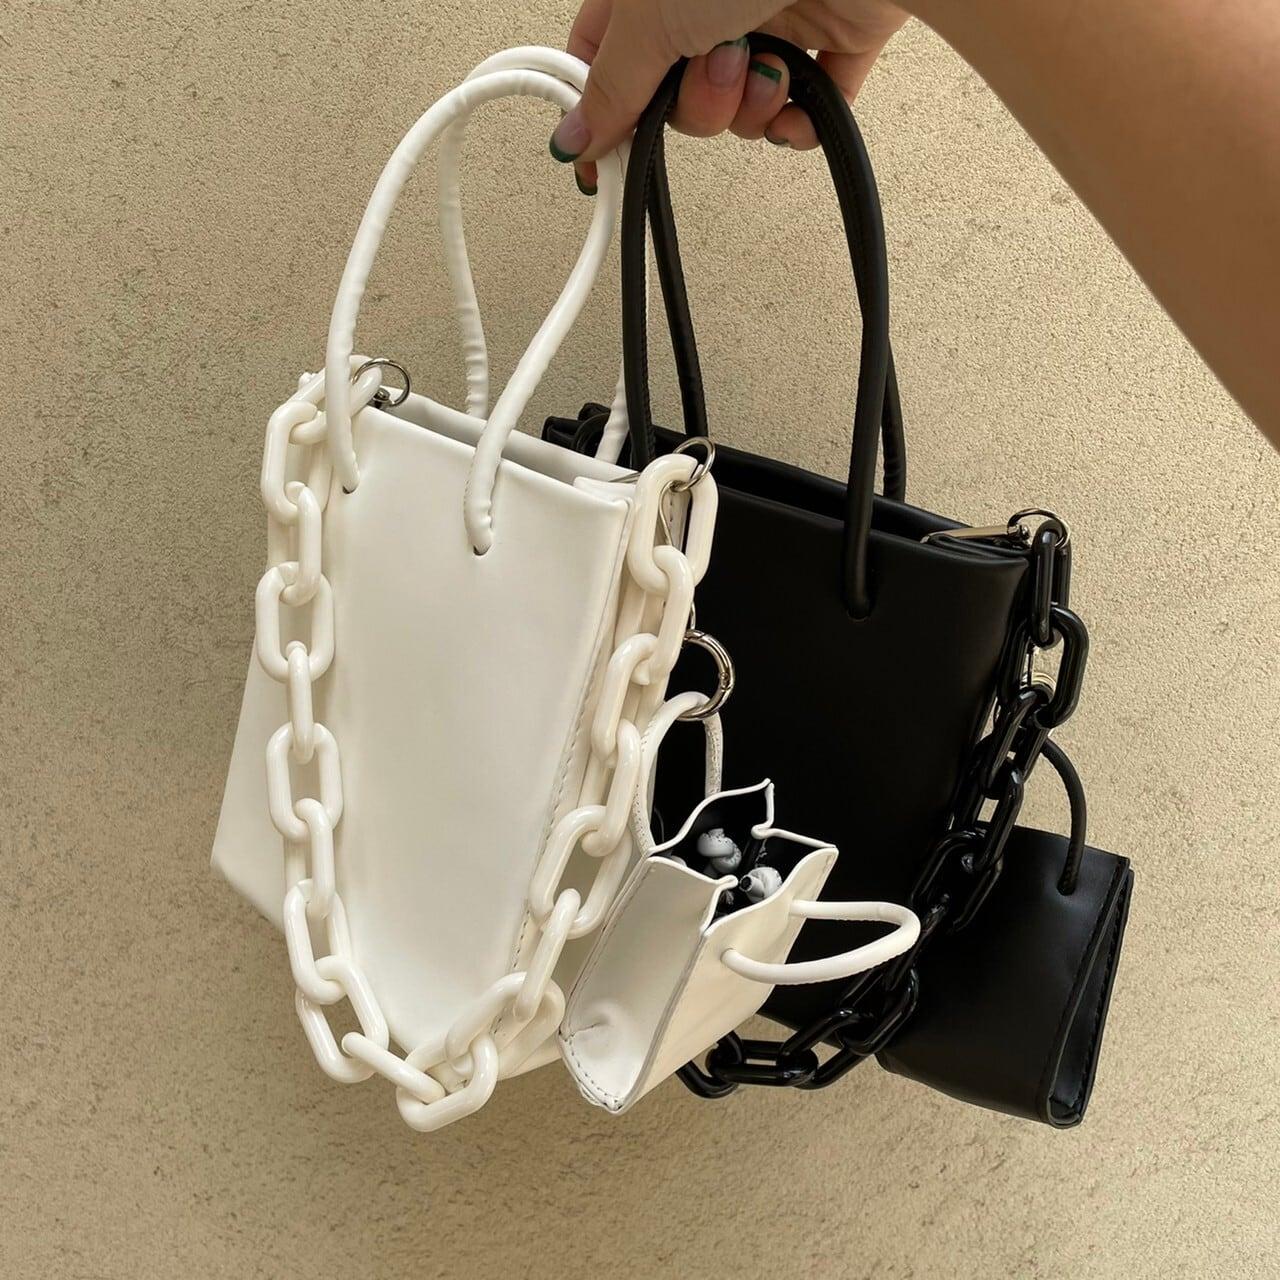 【Belle】LAST2 square chain bag / black